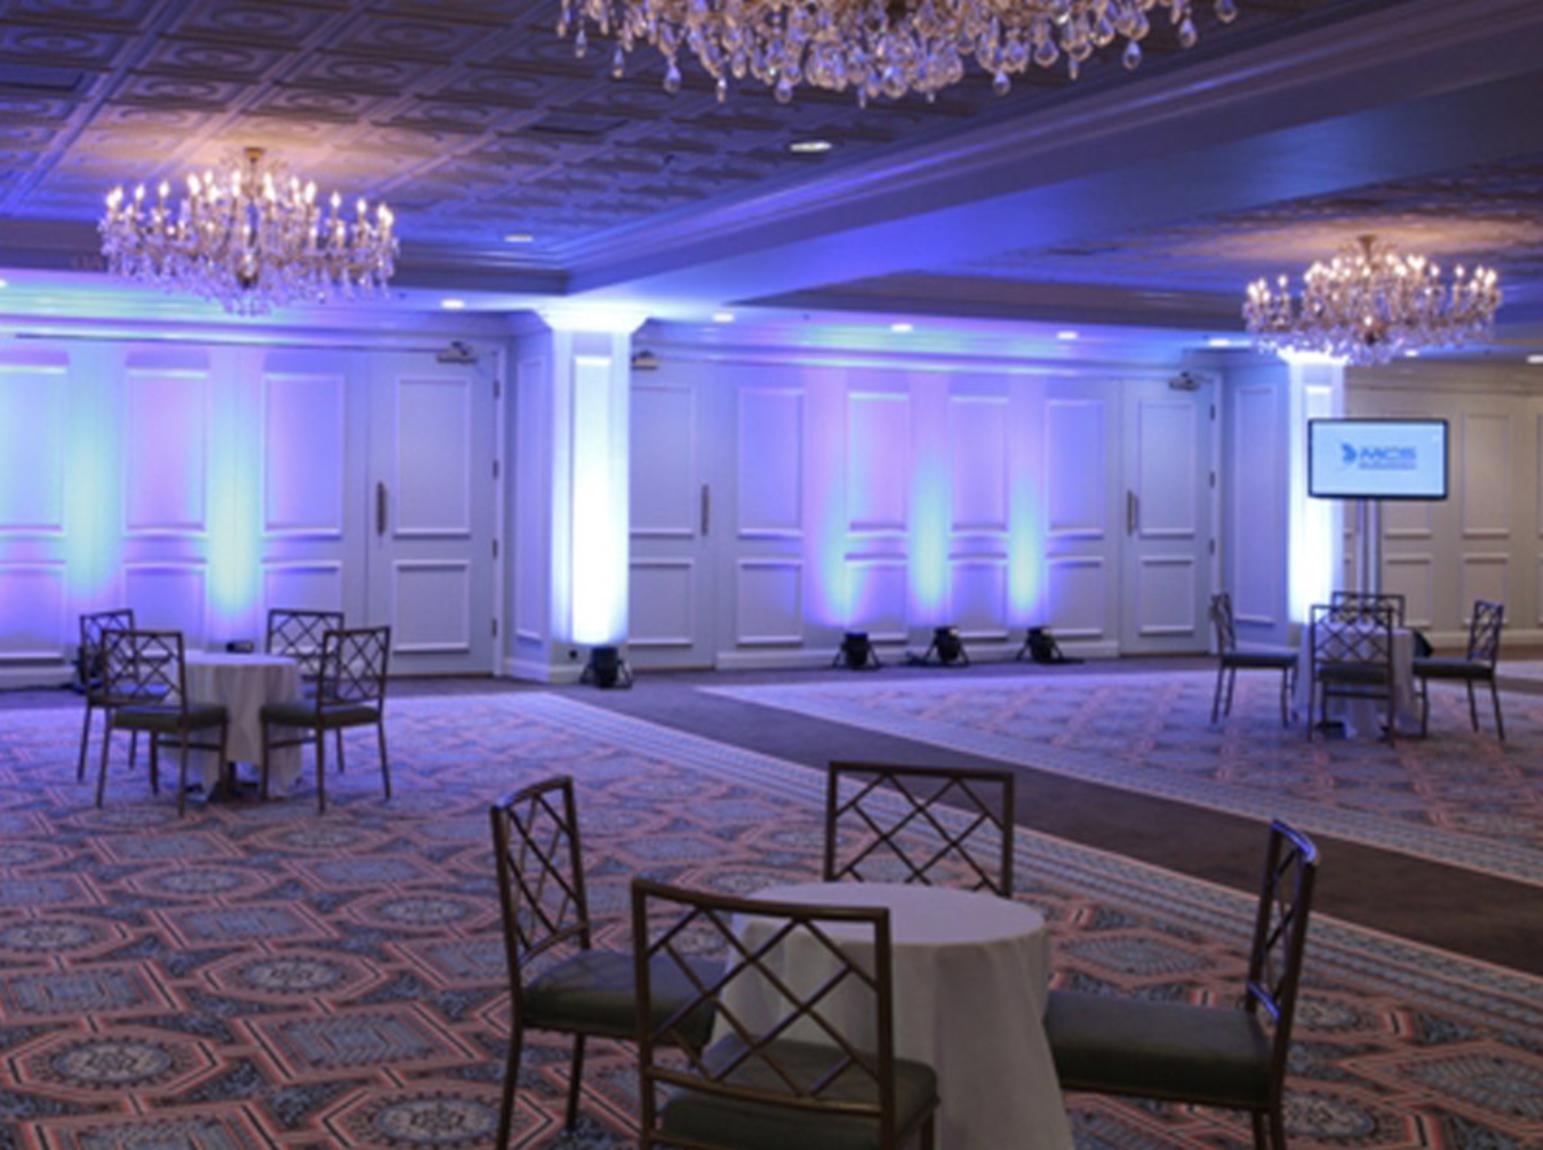 Empty hotel ballroom